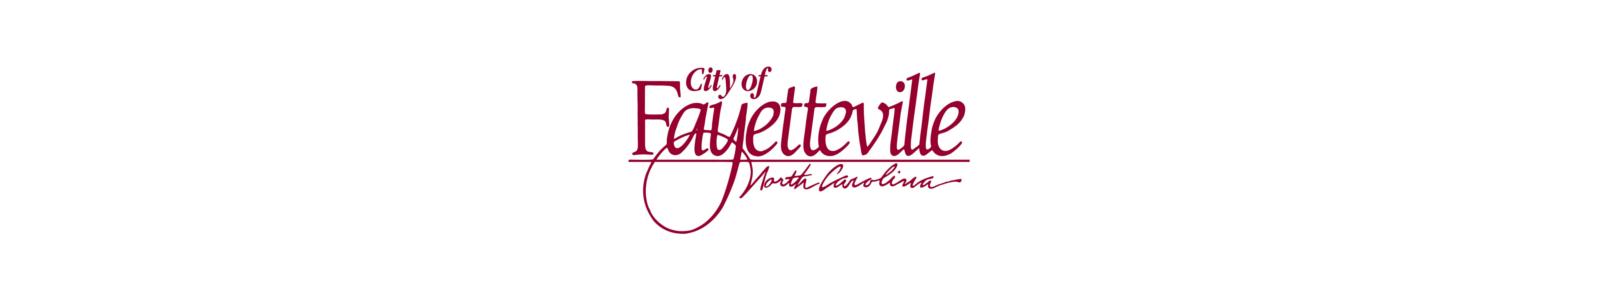 City of Fayetteville, NC, USA